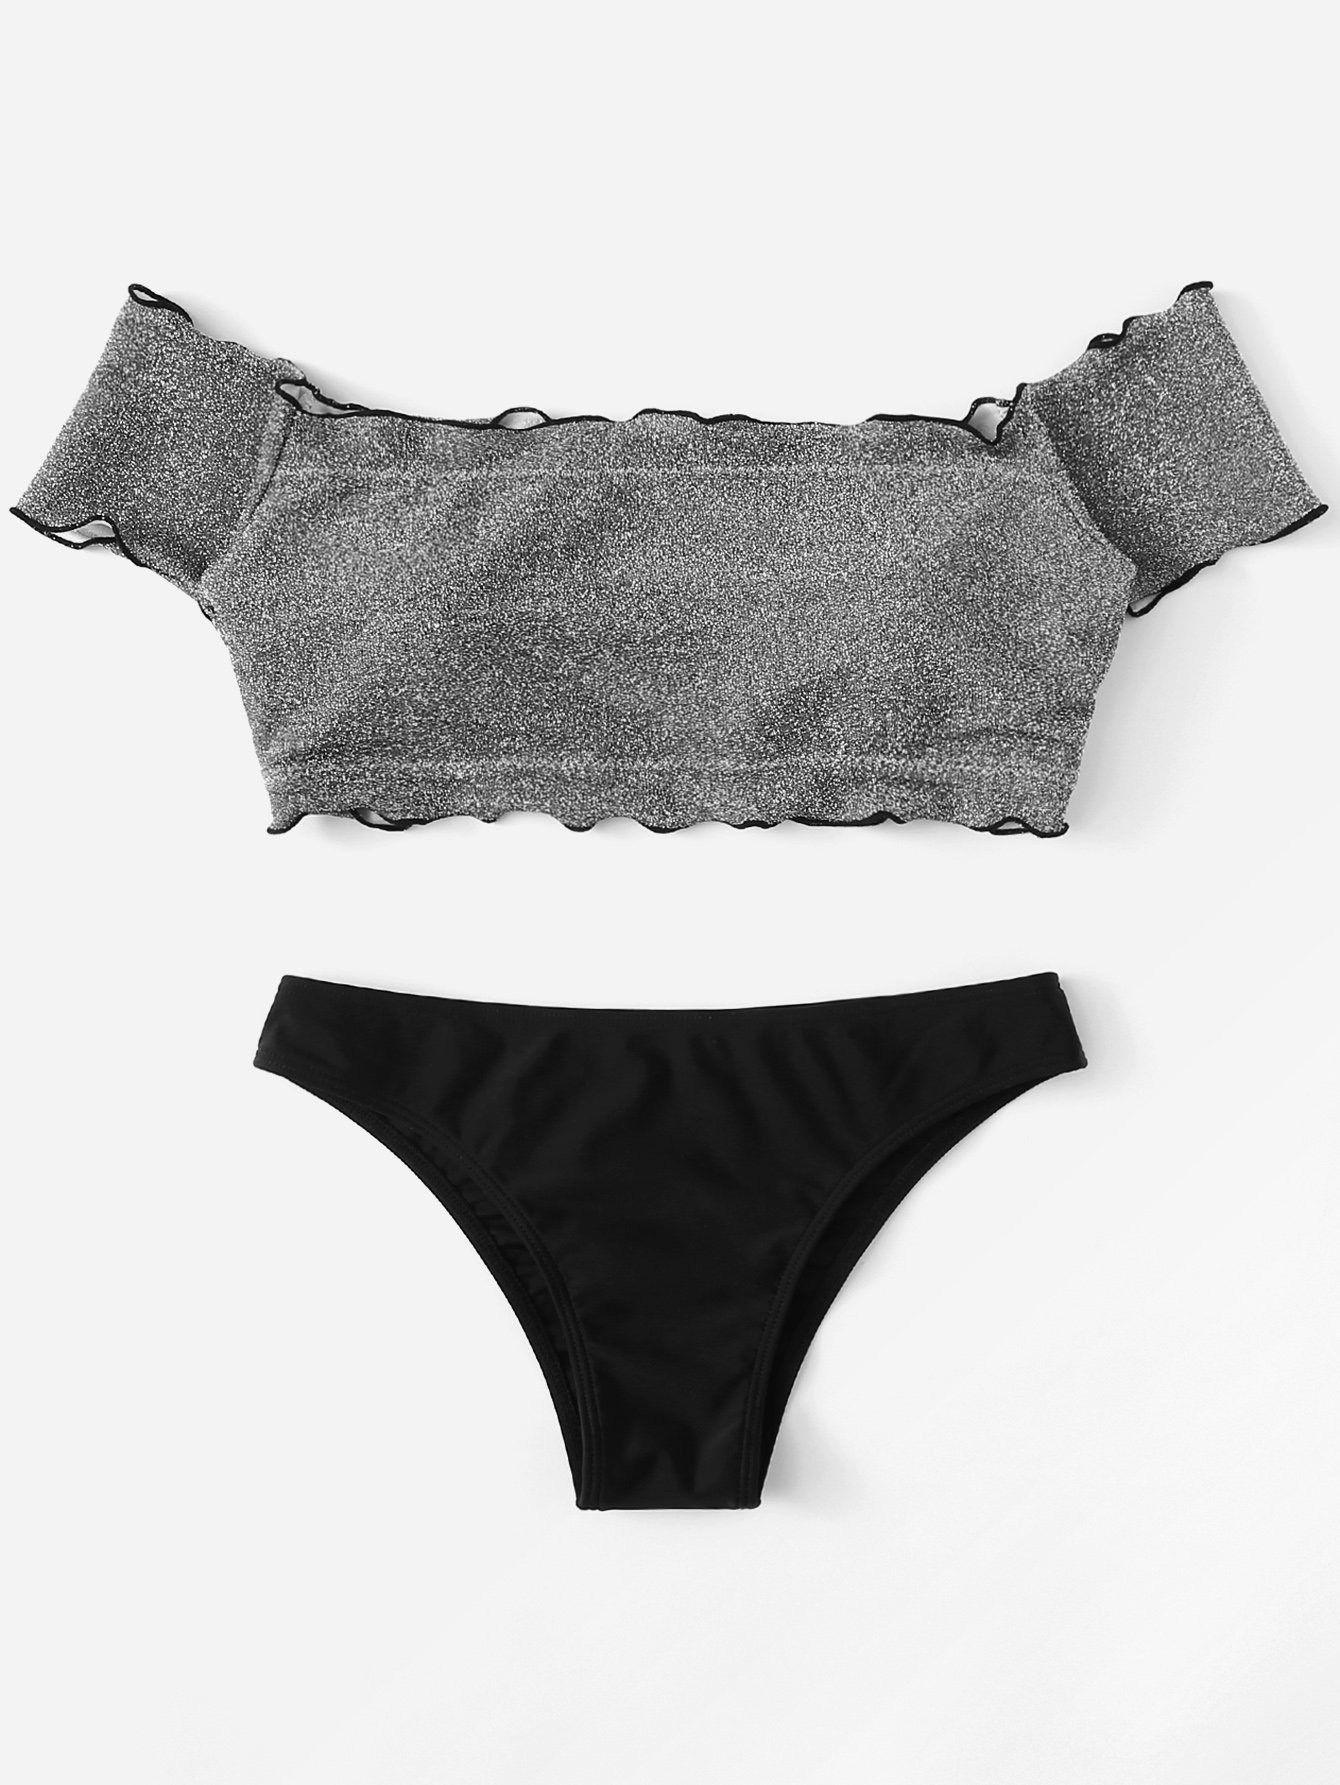 a50b56aae17 Lettuce Edge Glitter Bardot Bikini Set  swimsuits